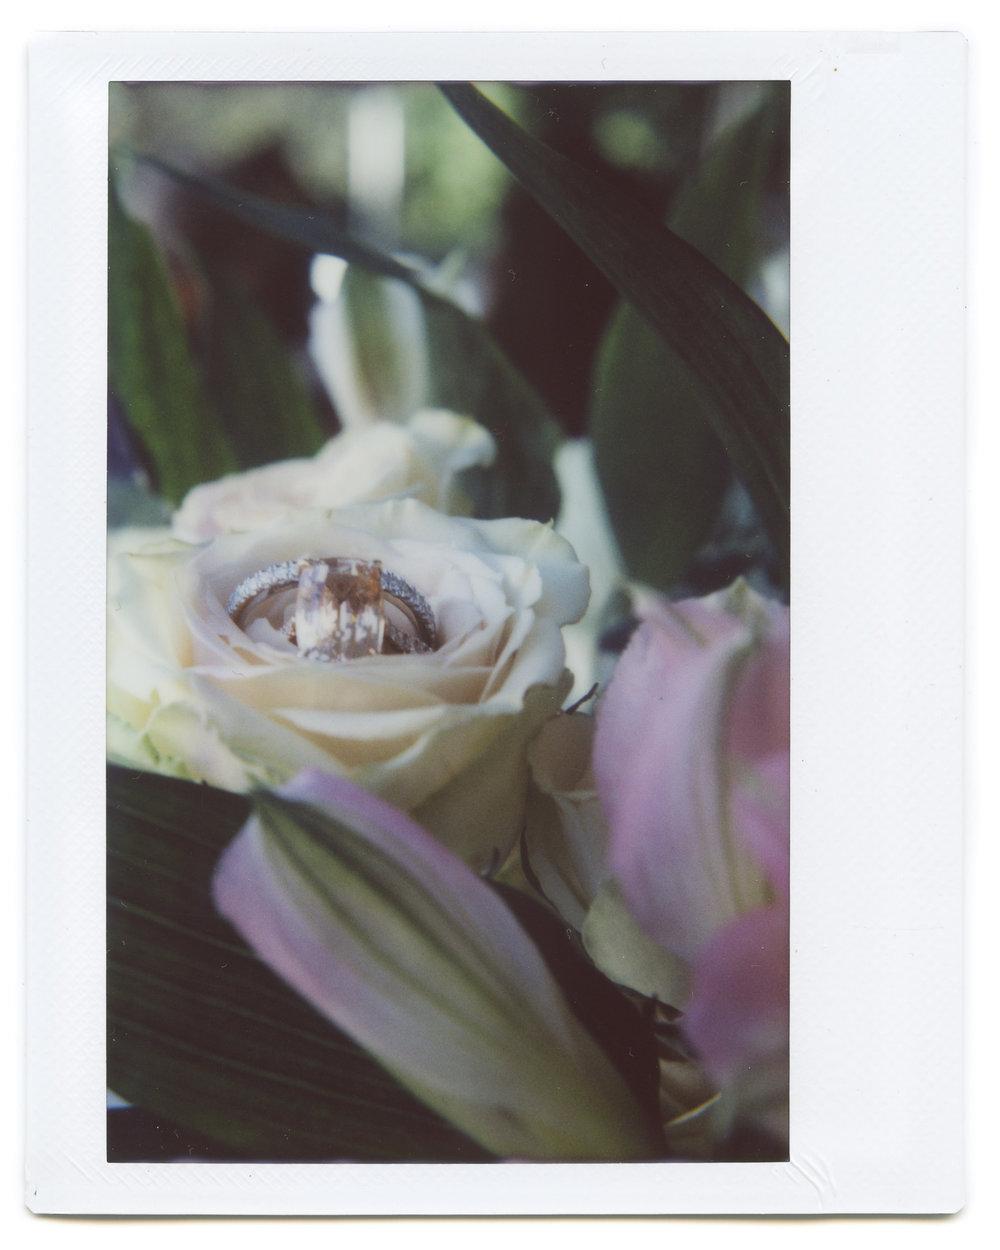 wedding ring instax